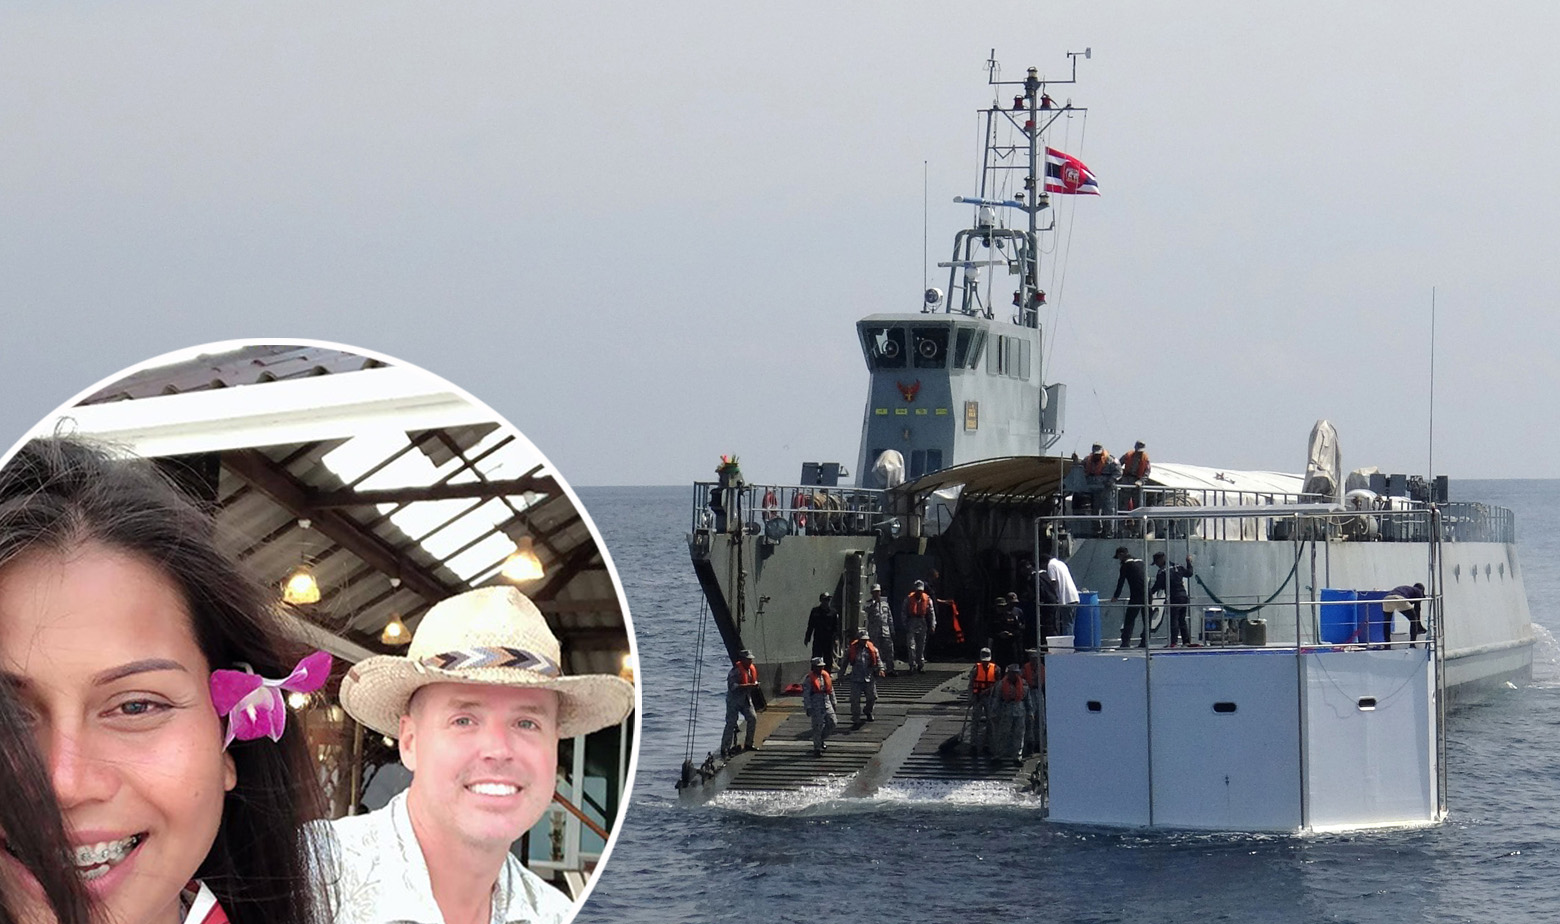 Chad Elwartowski, Nadia Supranee Thepdet i brod tajlandske mornarice koji tegli njihov morski dom